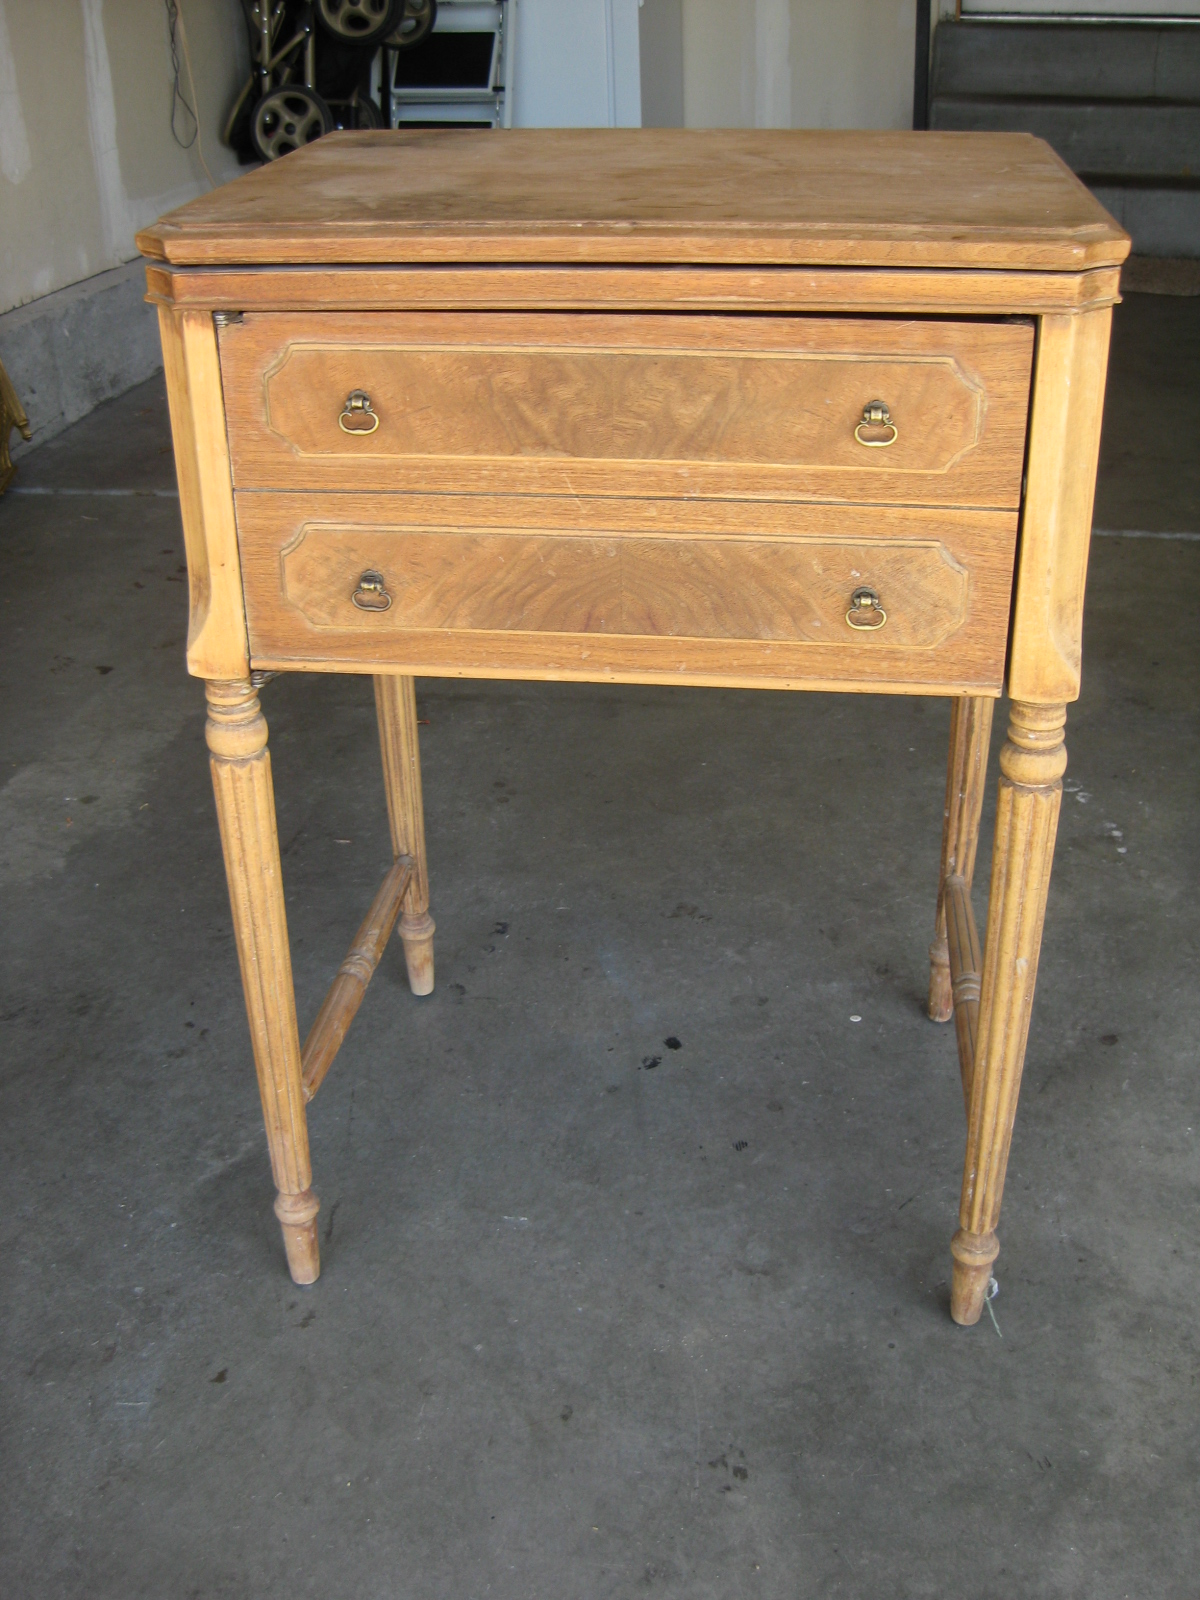 Tda Decorating And Design Thrift Store Furniture Finds